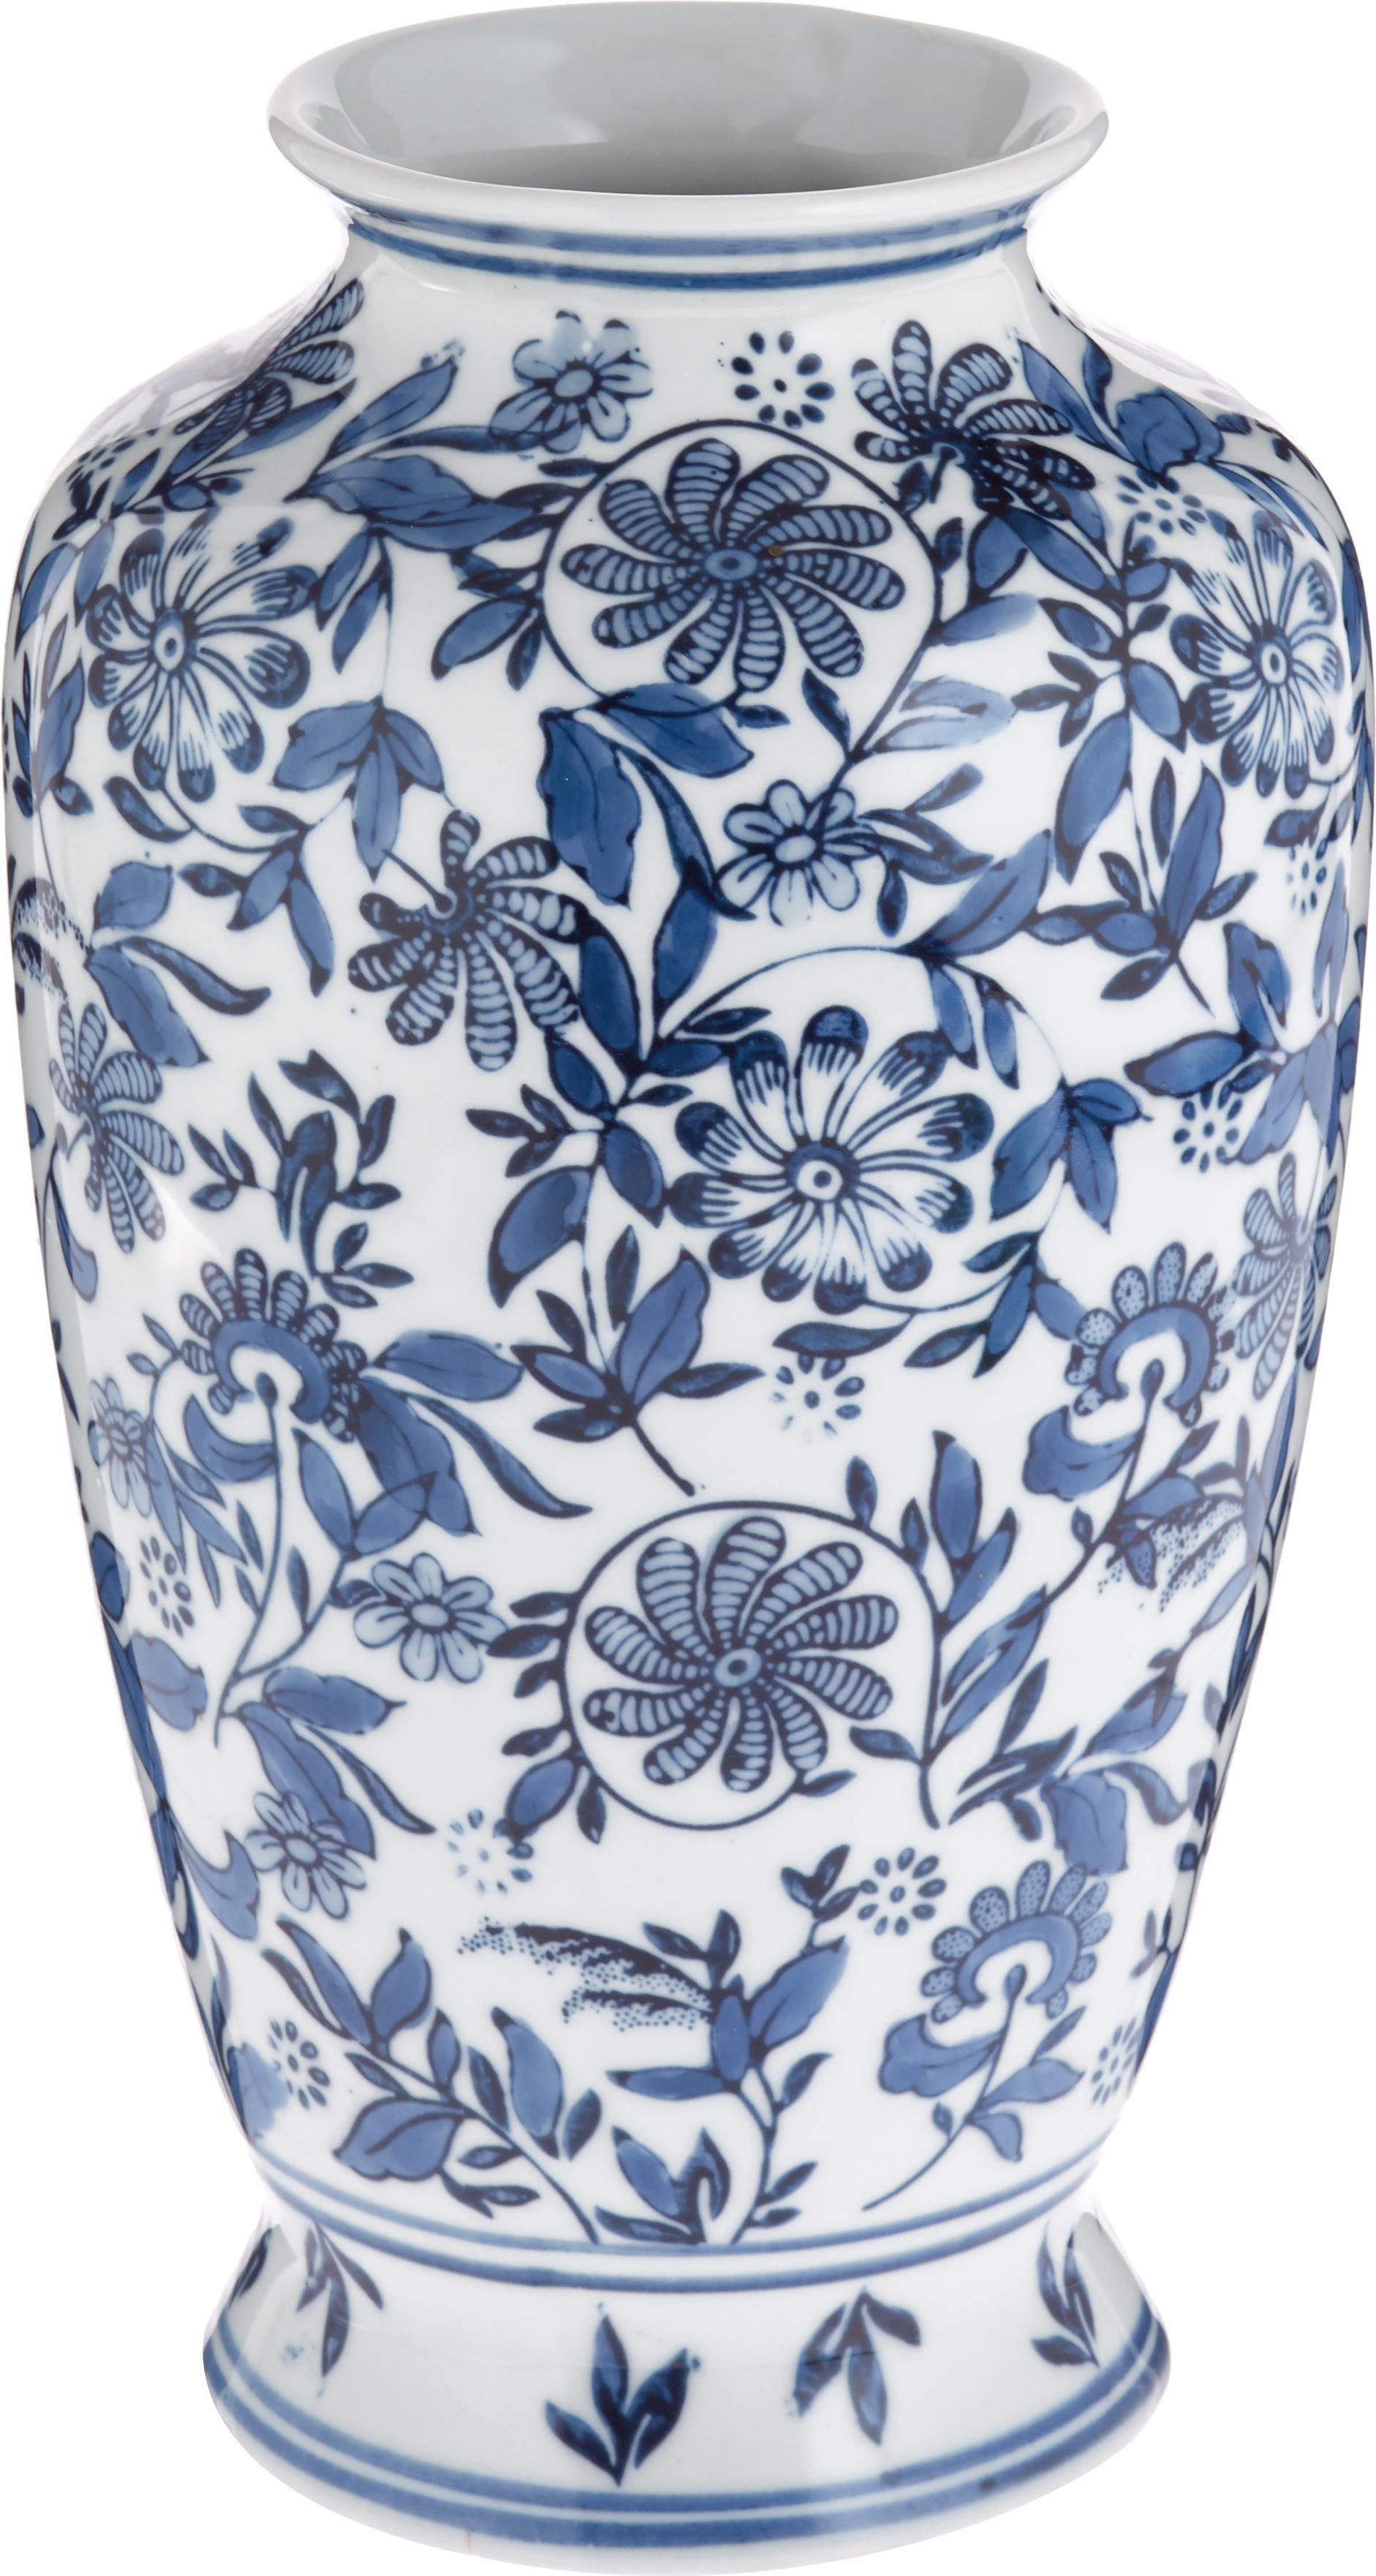 Jarrón de porcelana Lin, grande, Porcelana, no impermeable, Azul, blanco, Ø 16 x Al 31 cm